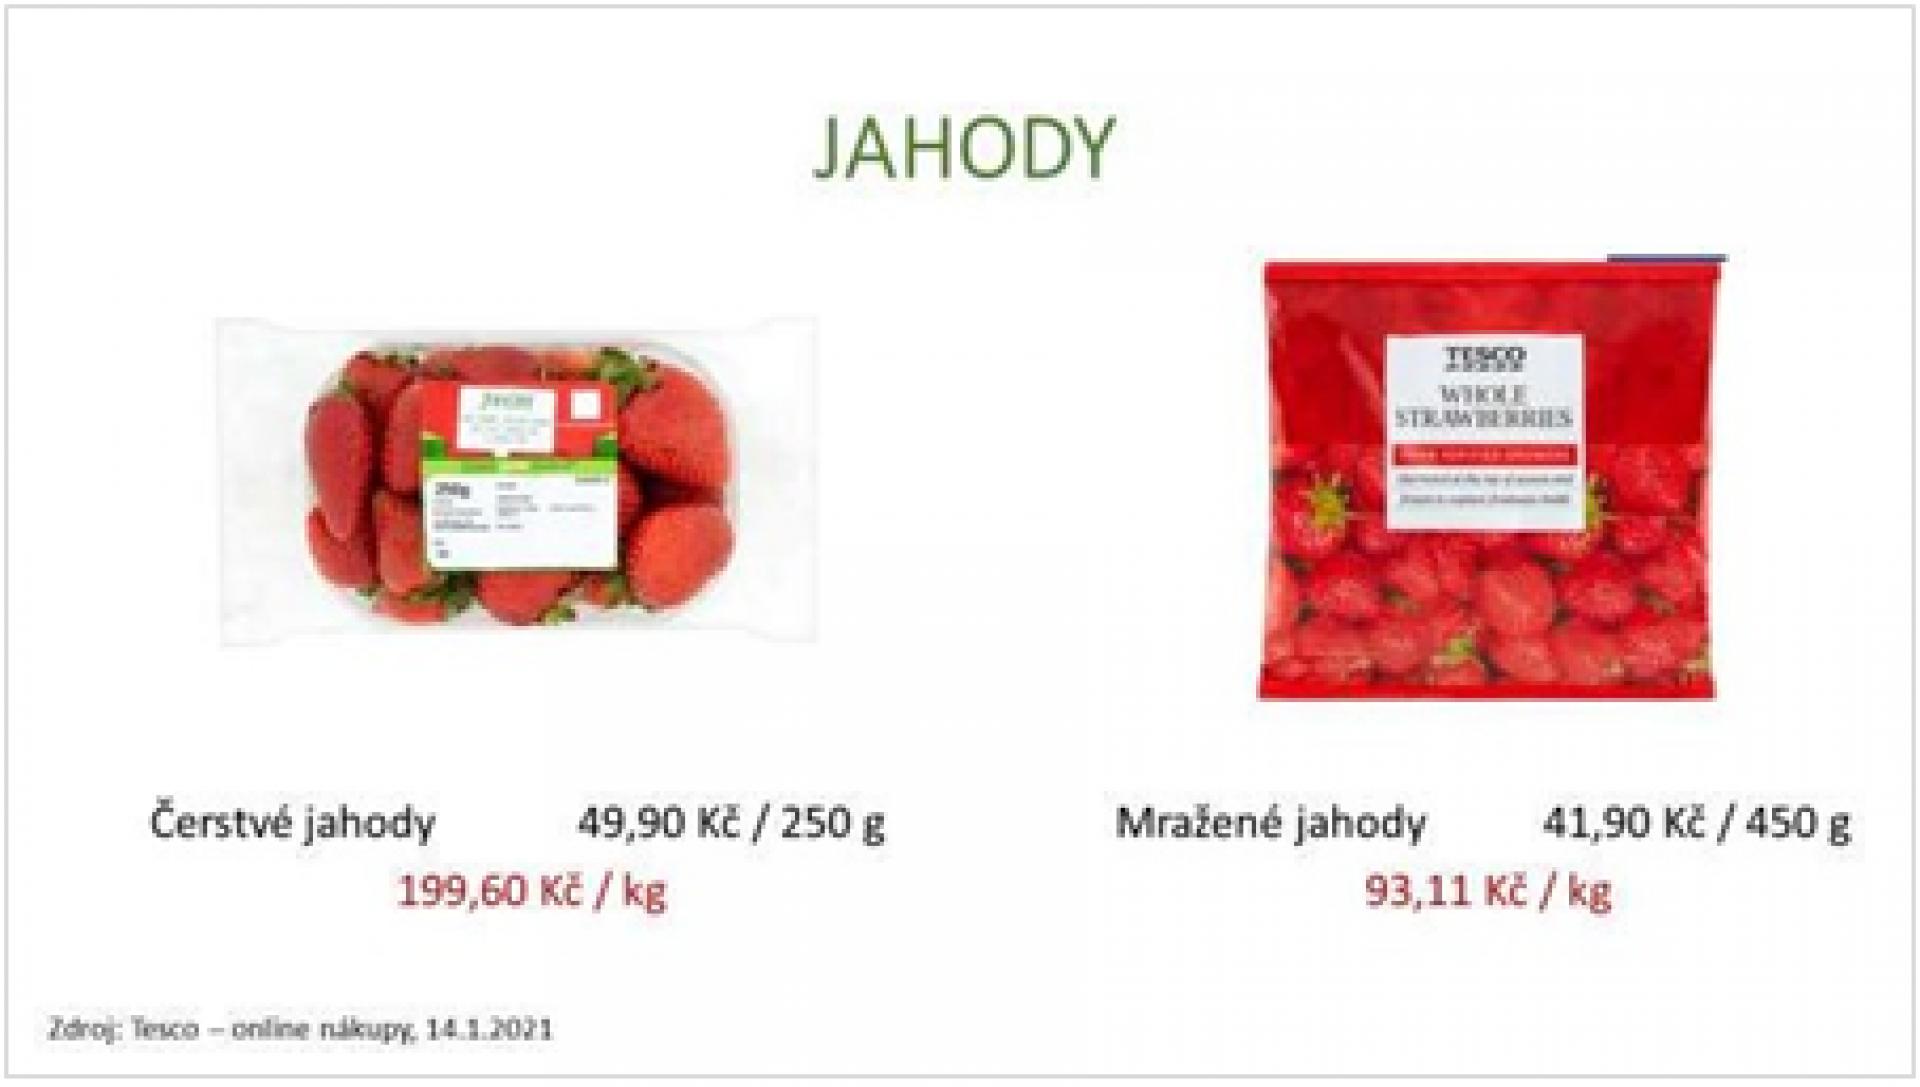 jahody.png